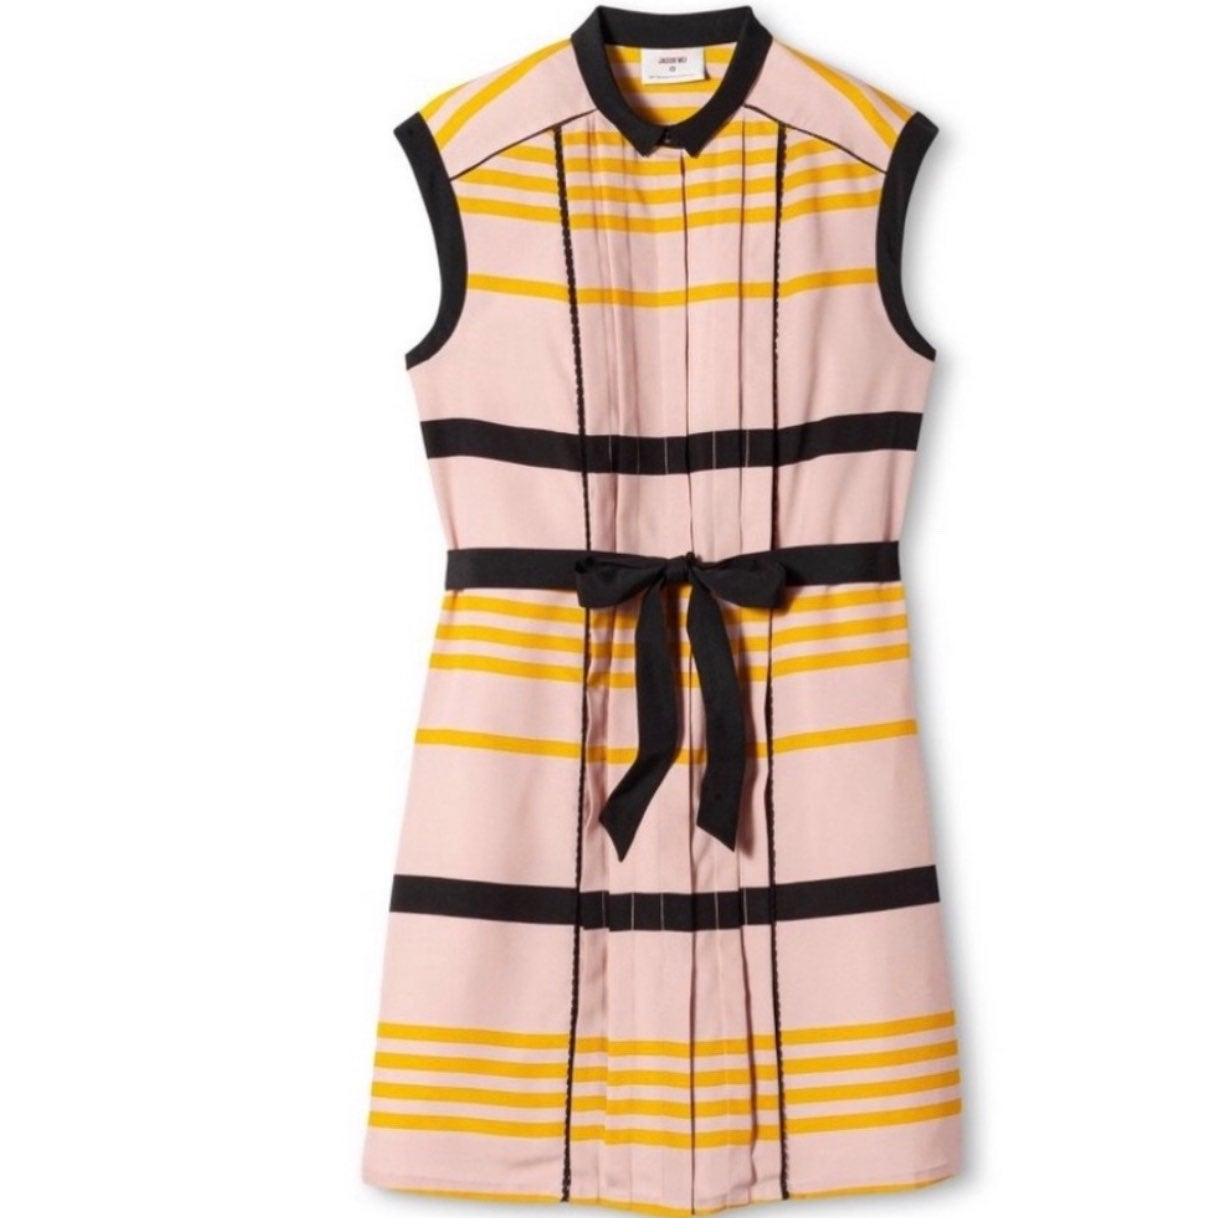 Jason Wu for Target Striped Shirtdress M